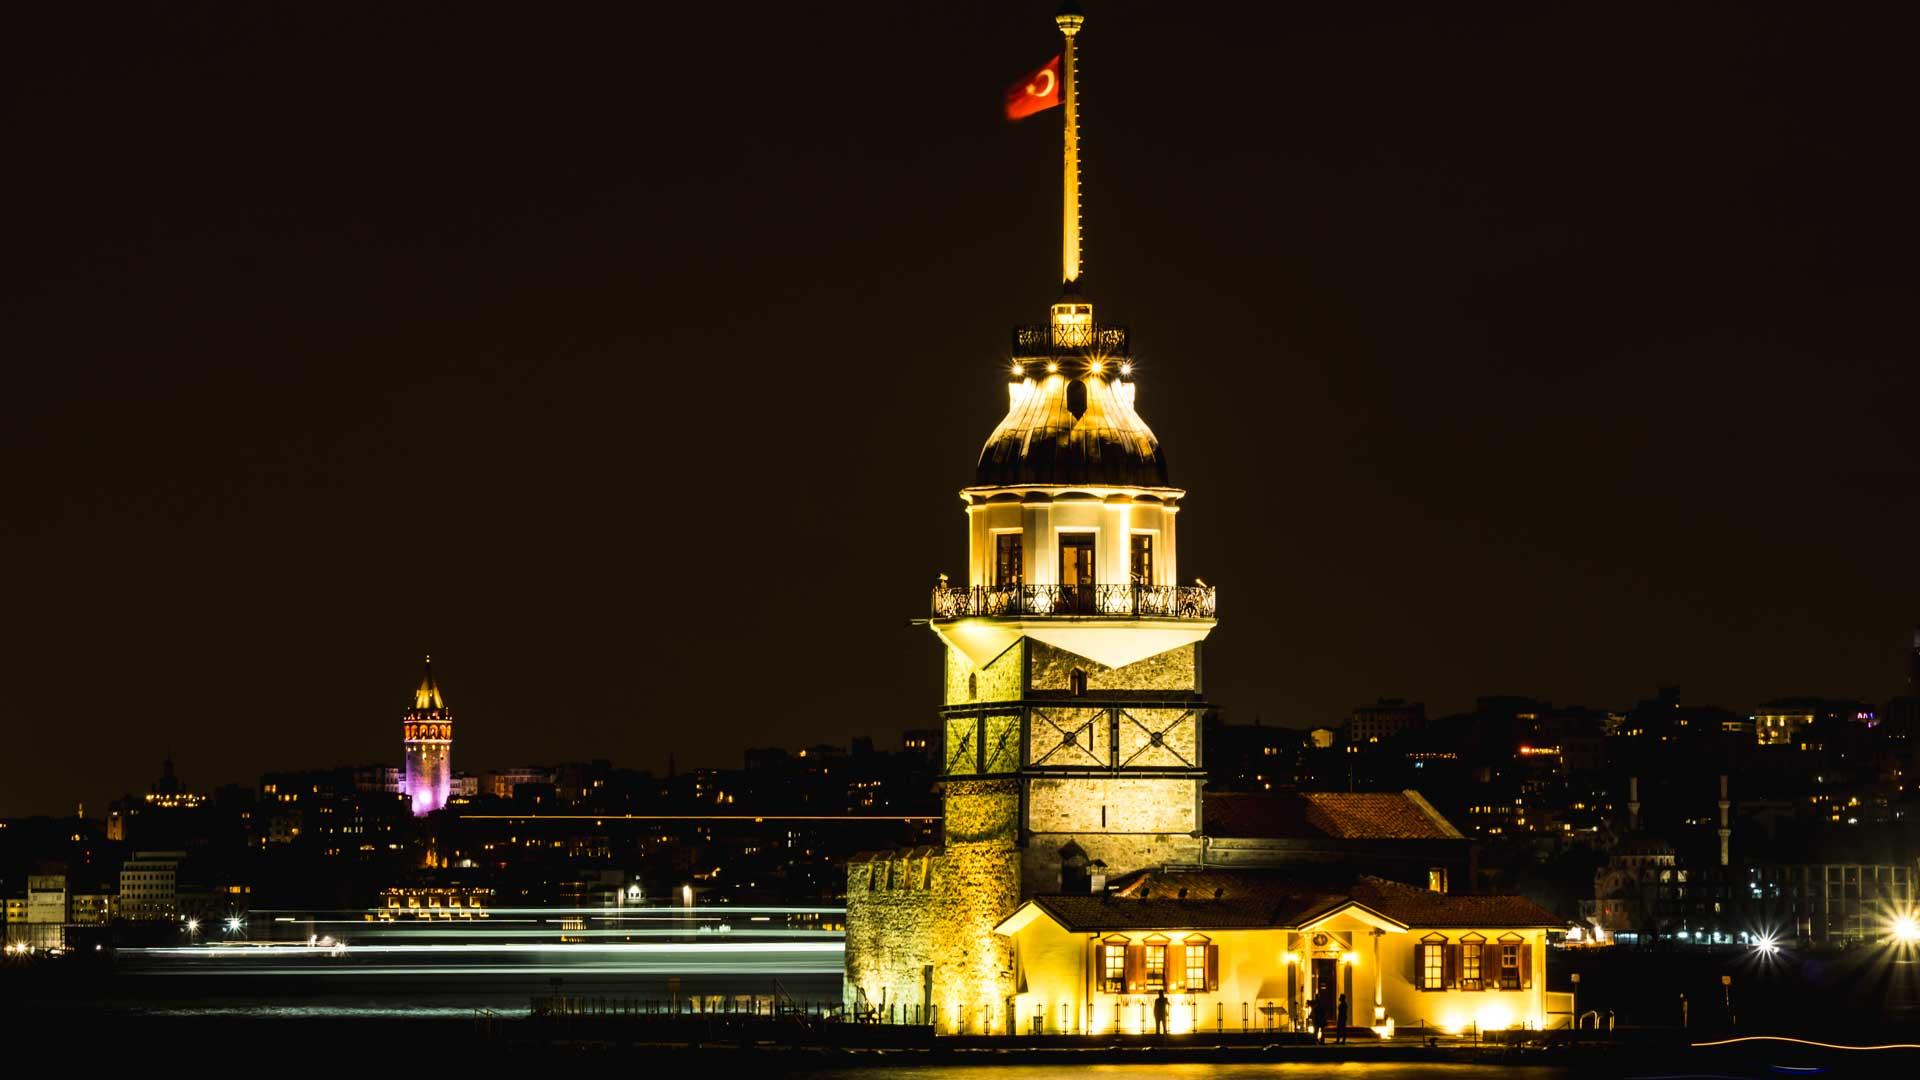 SerialHikers stop autostop world monde tour hitchhiking aventure adventure alternative travel voyage sans avion no fly Istanbul turkey maiden tower turquie